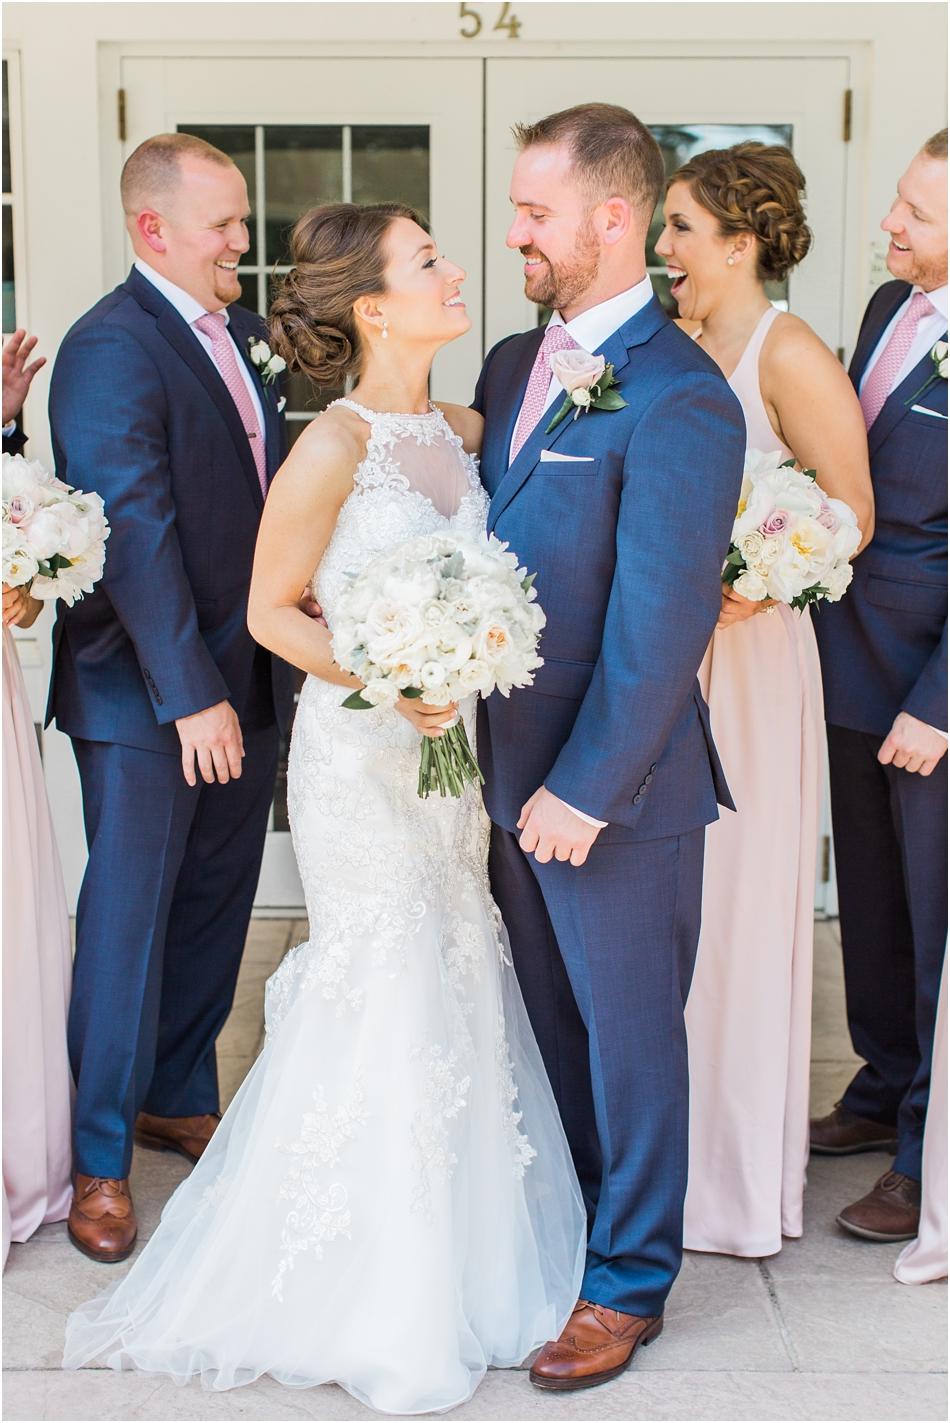 pine_hills_mirbeau_golf_club_boston_massachusetts_cape_cod_new_england_wedding_photographer_Meredith_Jane_Photography_photo_1702.jpg